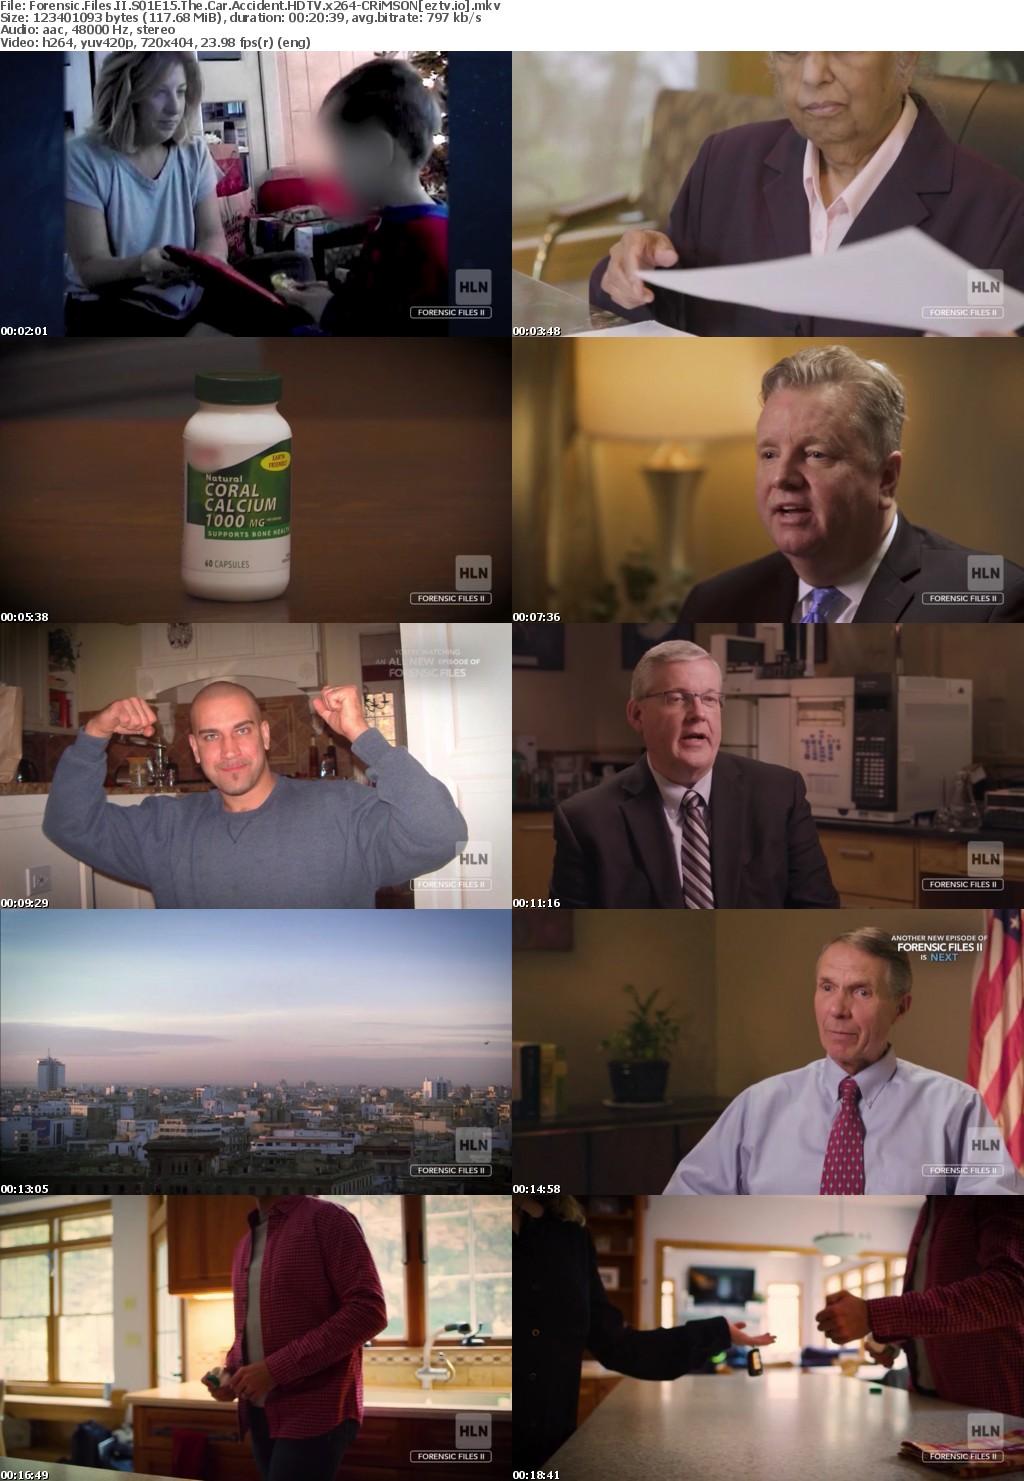 Forensic Files II S01E15 The Car Accident HDTV x264-CRiMSON